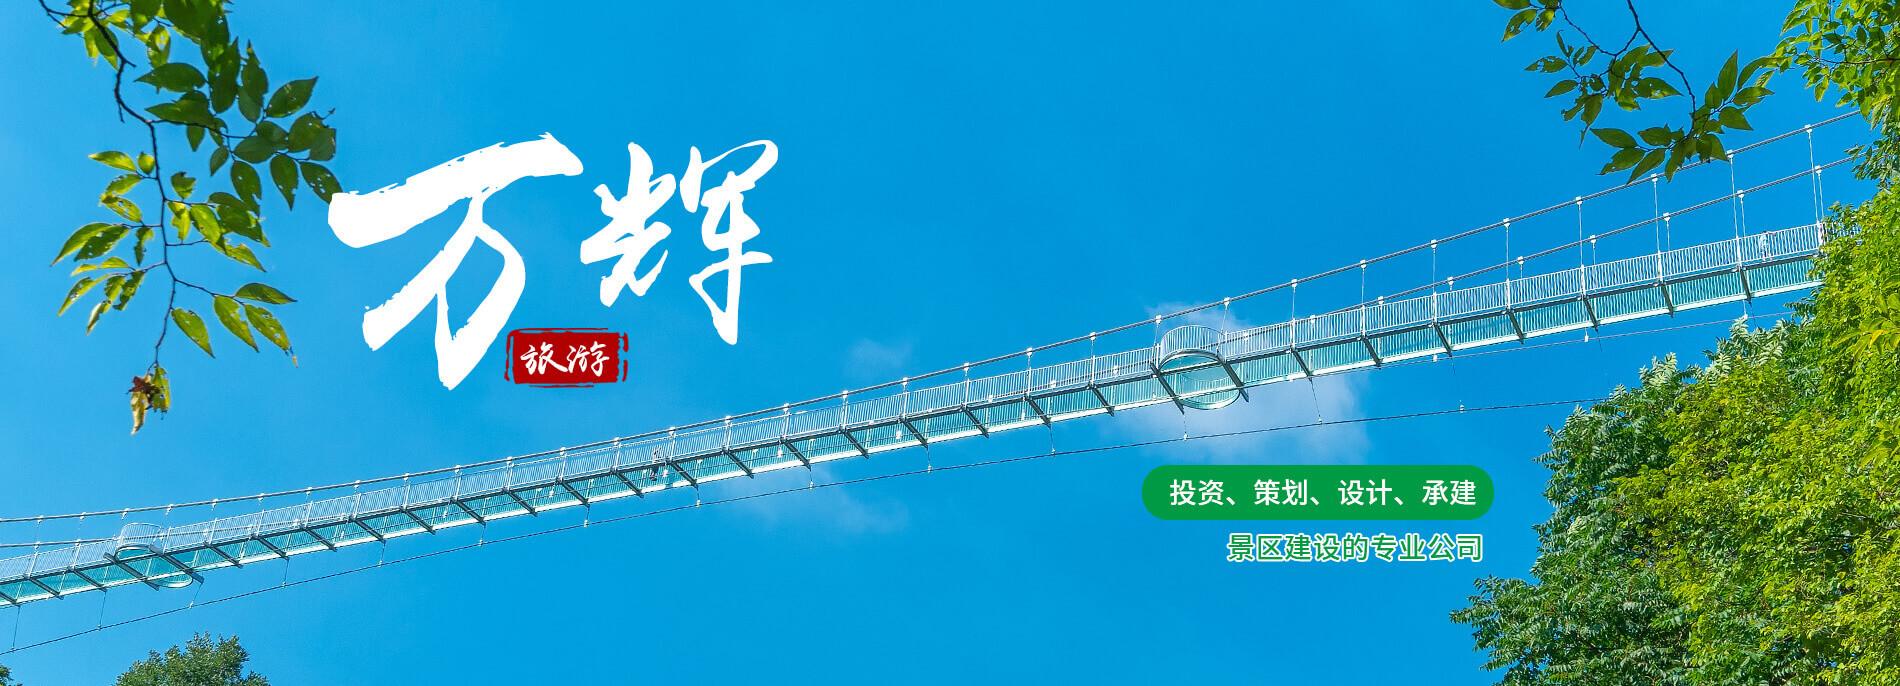 bo璃滑dao建设|bo璃shui滑dao安装|bo璃shui滑dao设计施工-河nan万辉旅游资源kai发有限公司